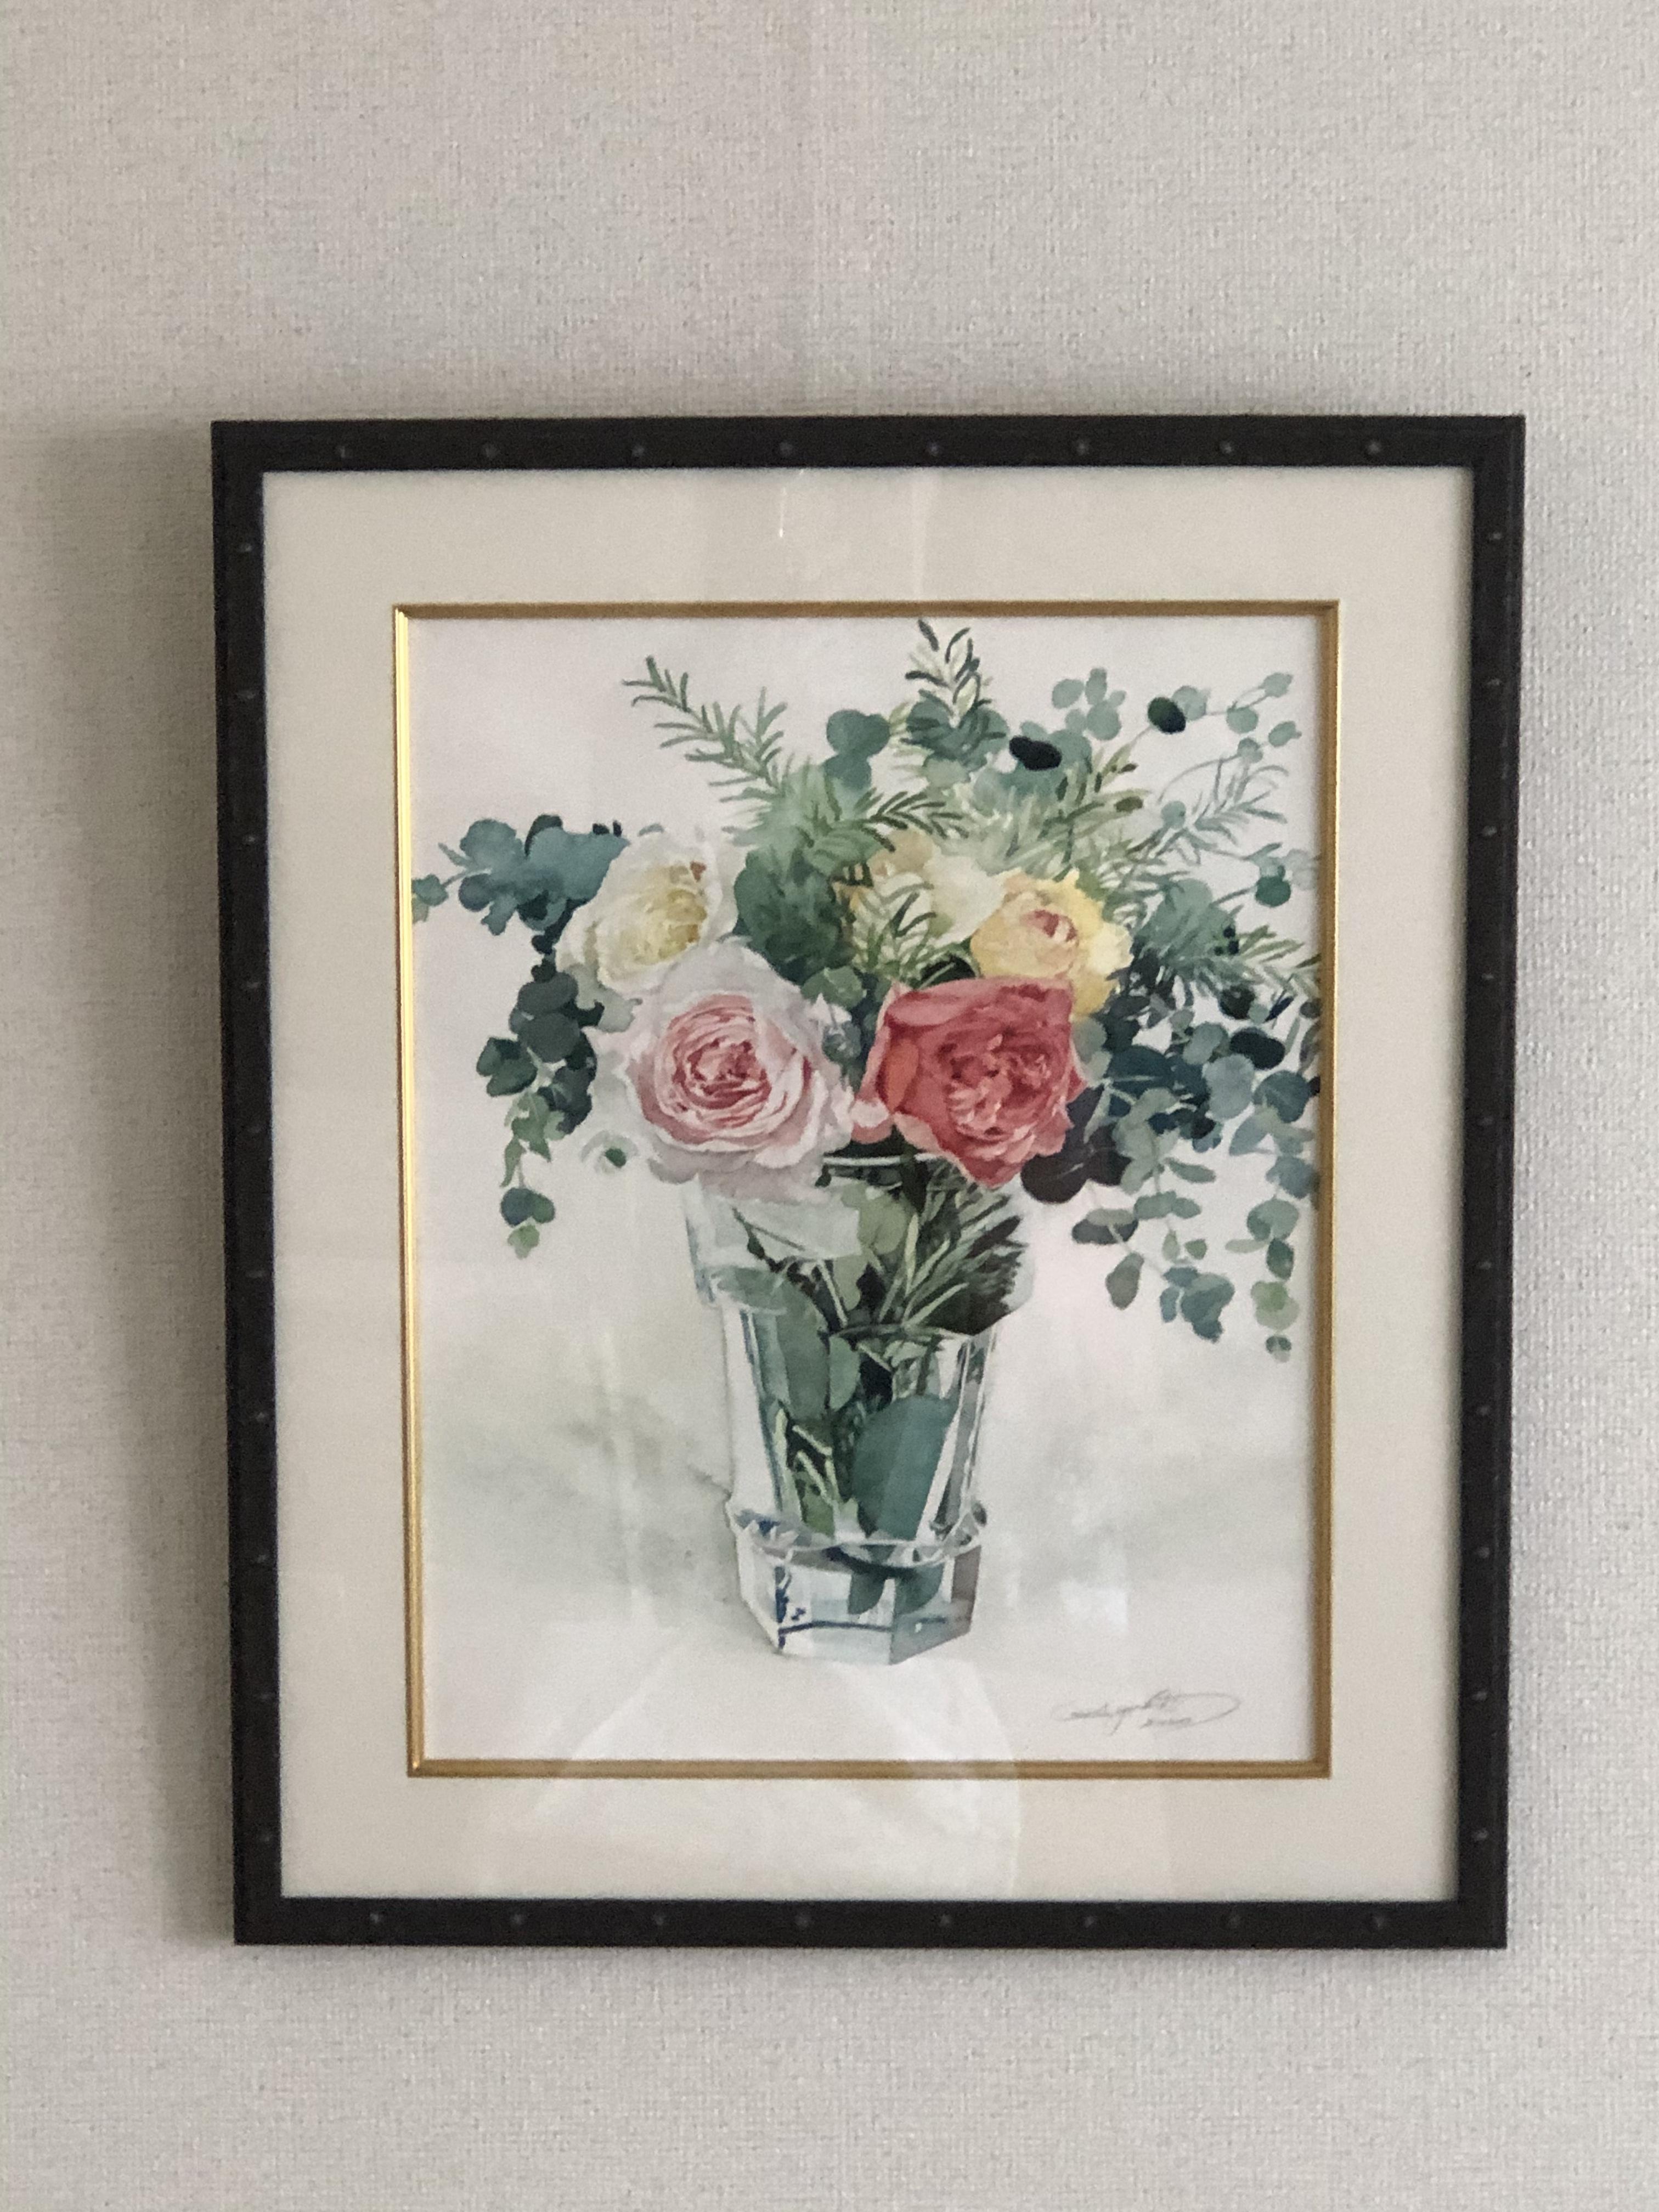 F6サイズ バラの水彩画描きおこしオーダー - F6 size rose watercolor drawing order